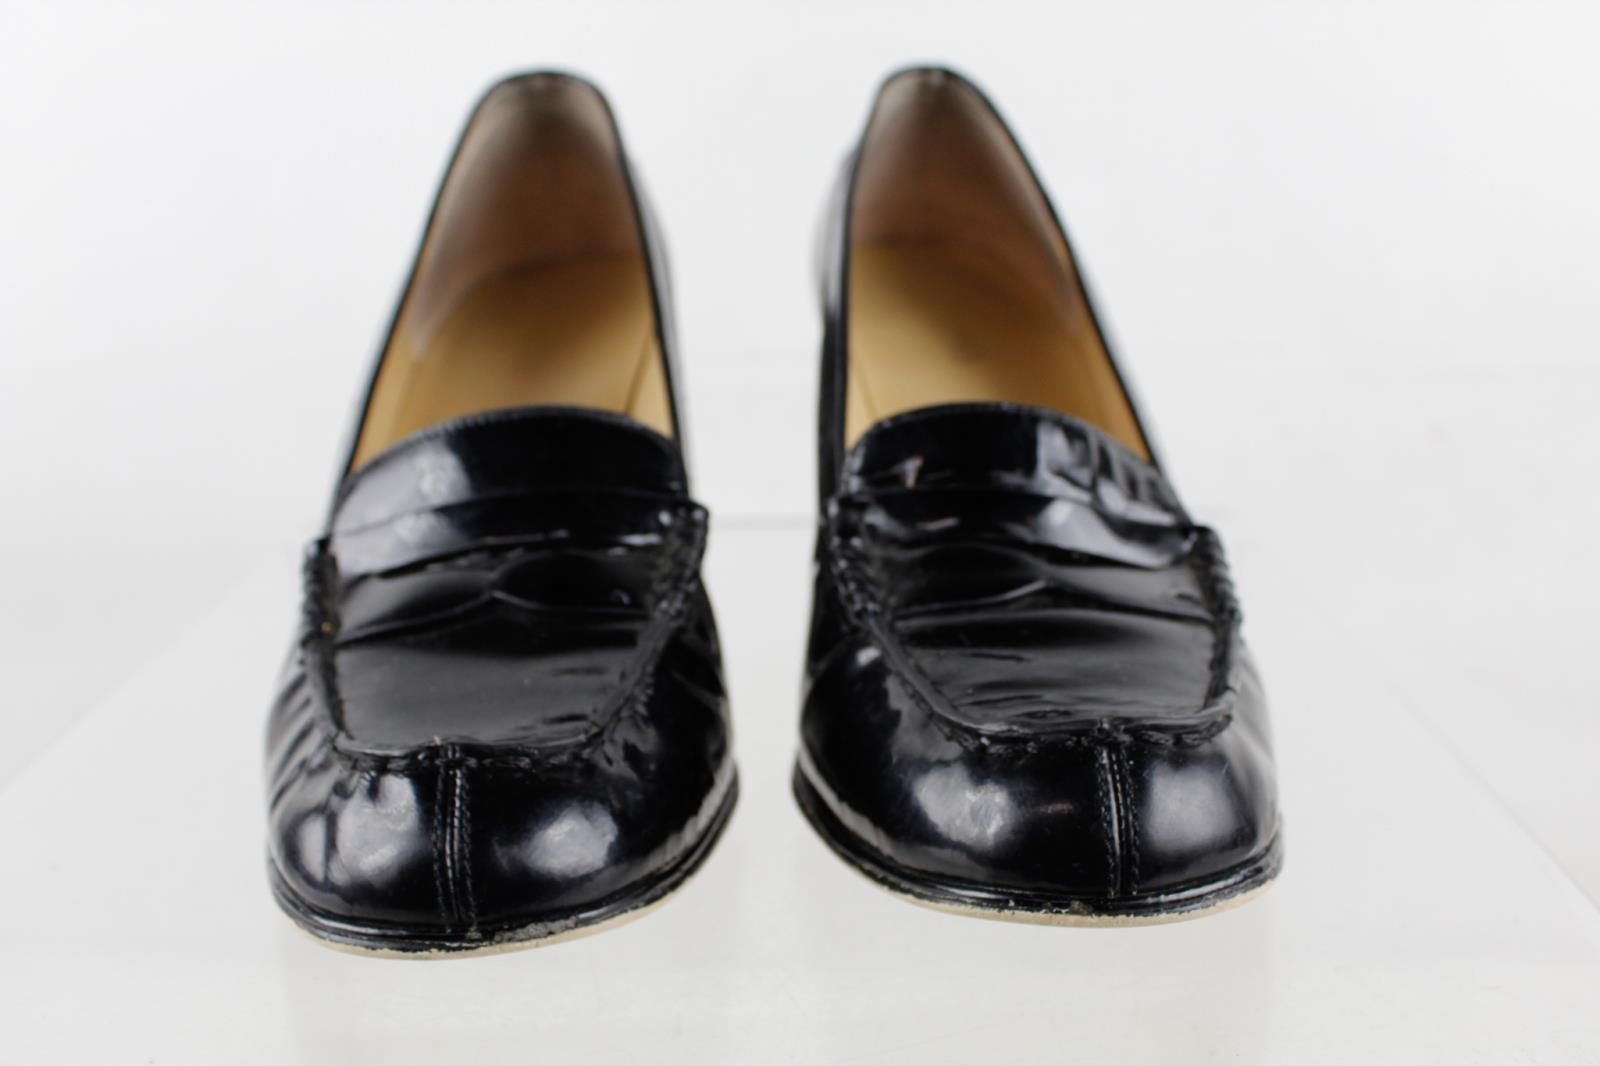 ba91d640a5b Michael Michael Kors Black Patent Leather Chunky Heel Penny Loafer Pumps SZ  7.5M